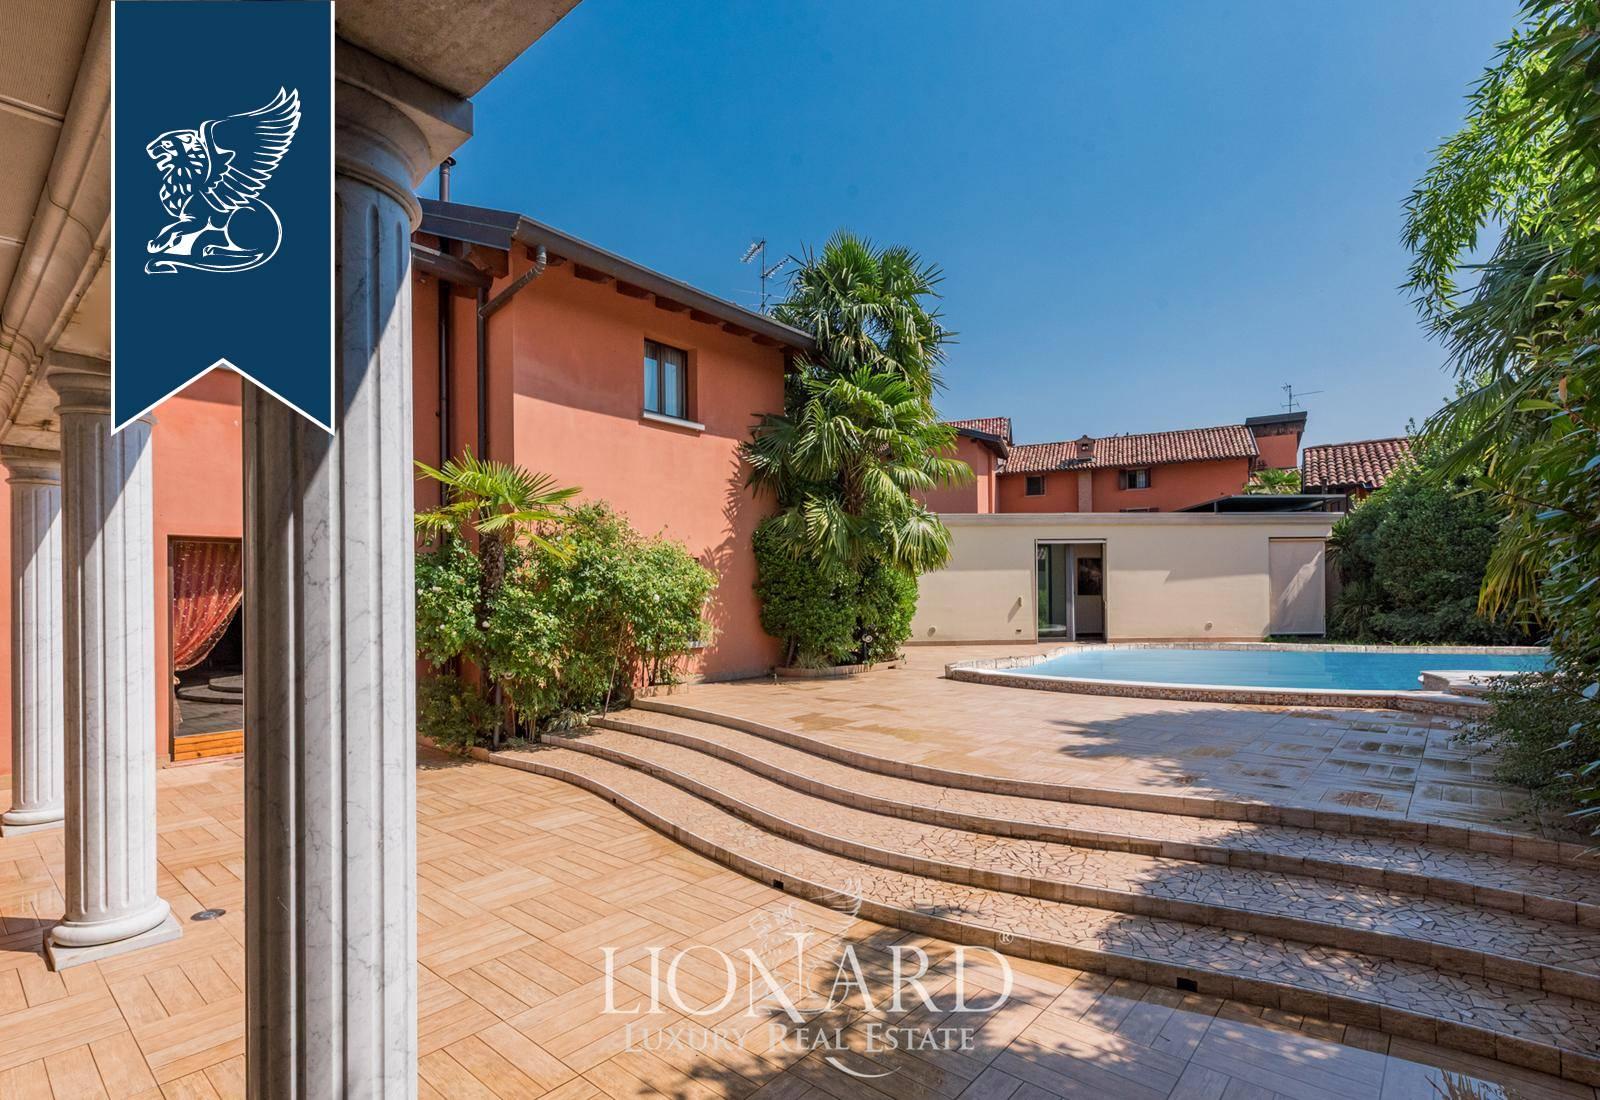 Villa in Vendita a Fara Gera D'Adda: 0 locali, 1350 mq - Foto 5